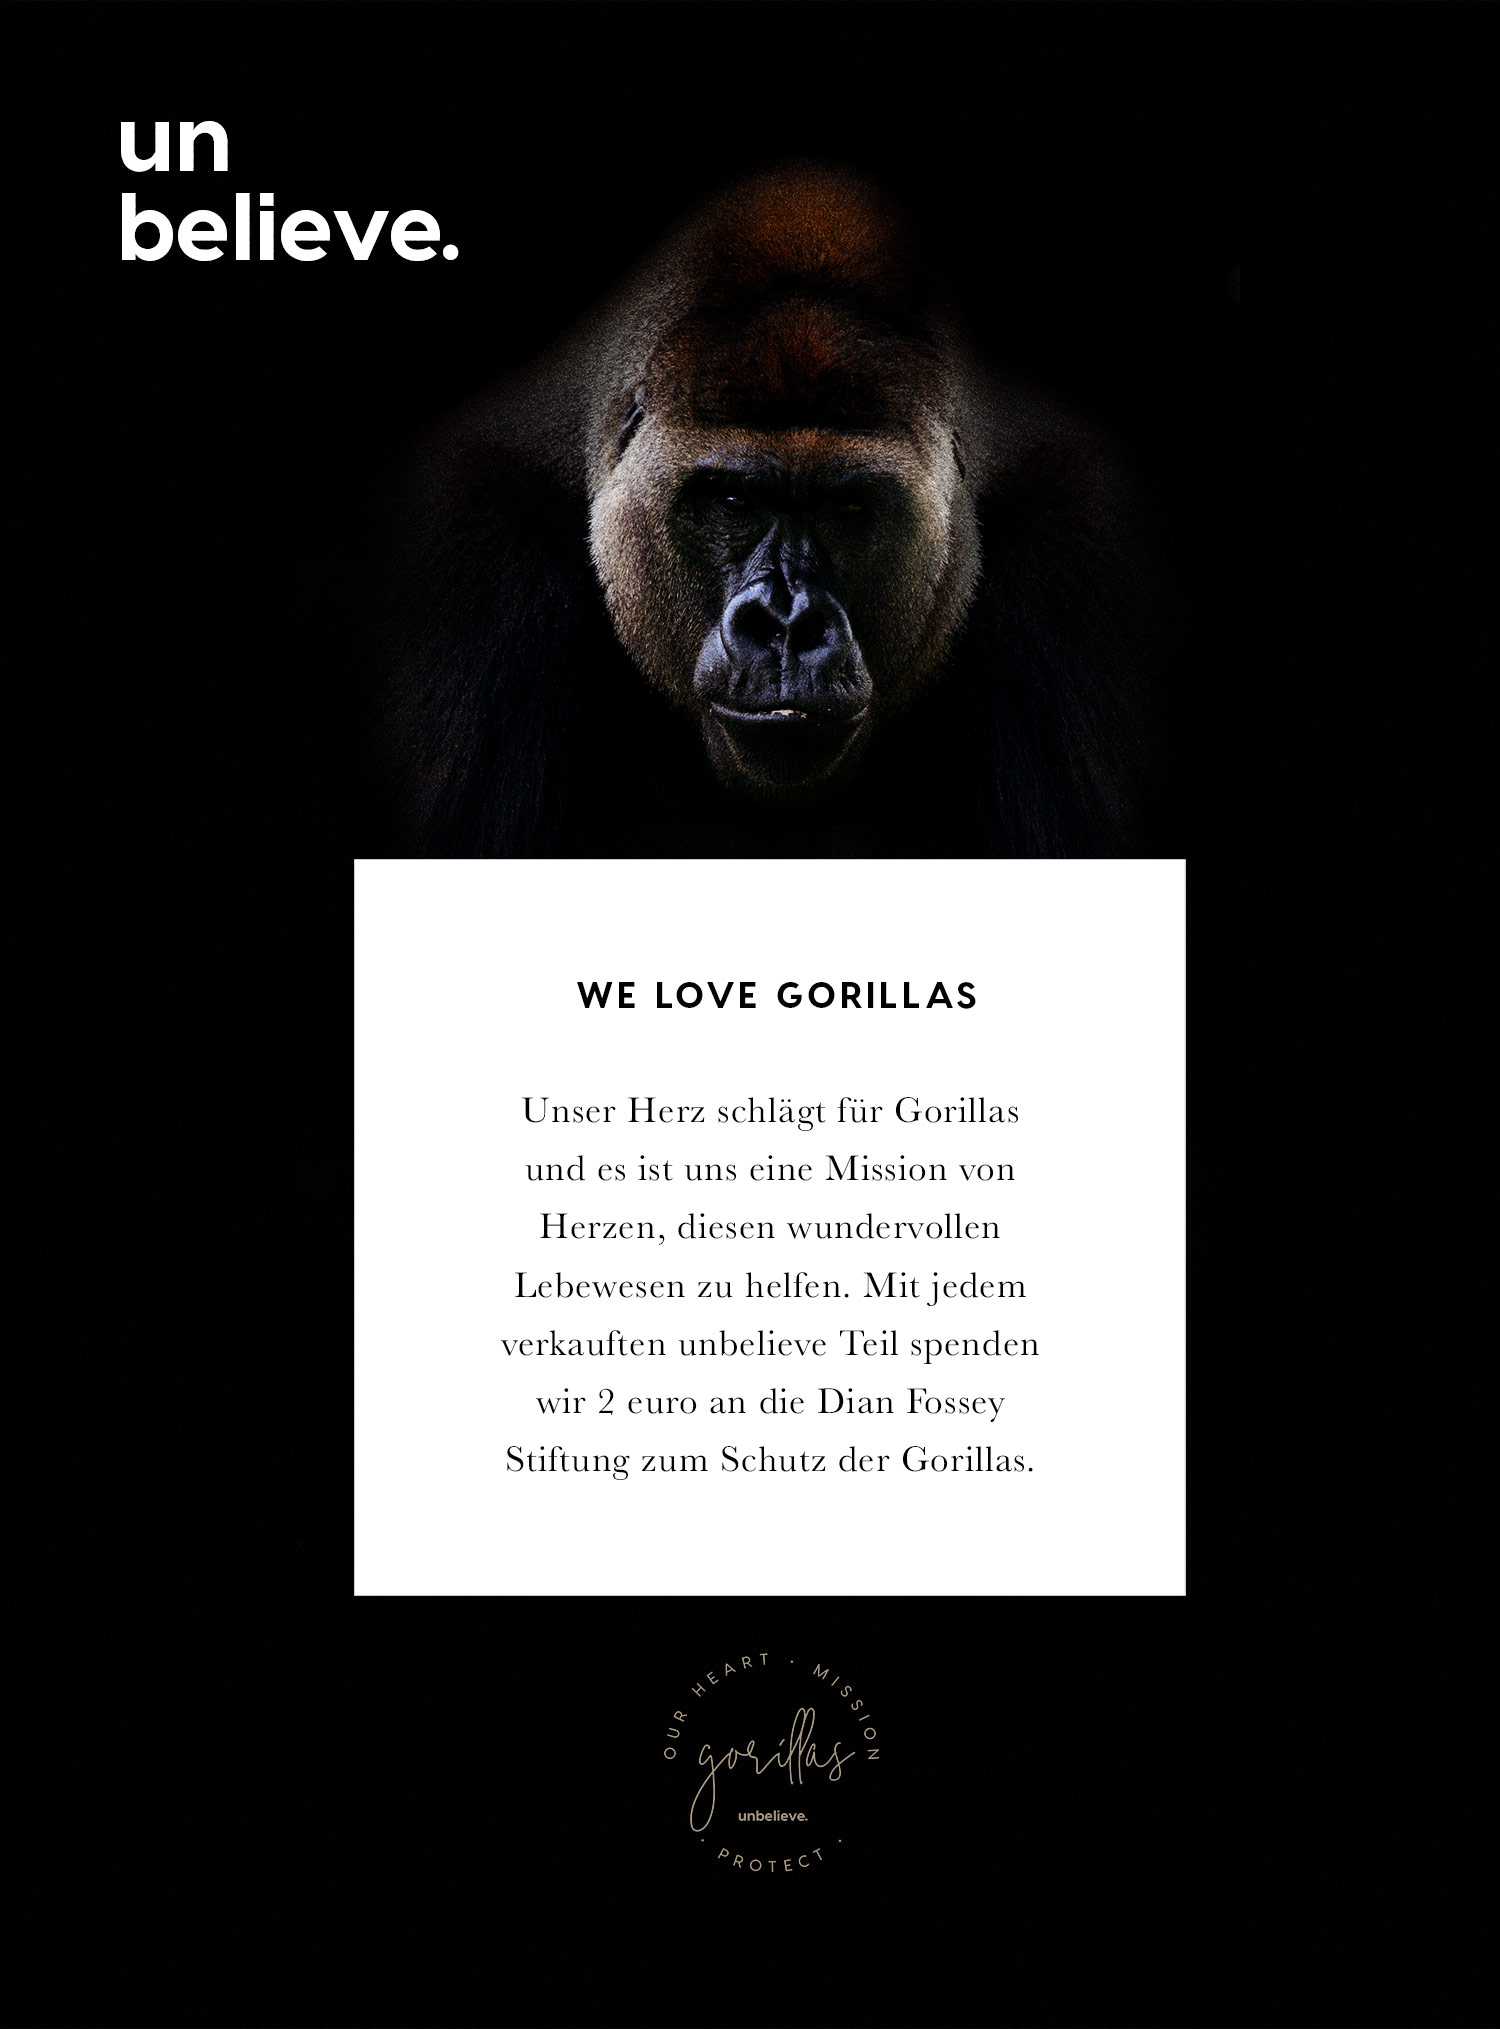 gorilla-tag